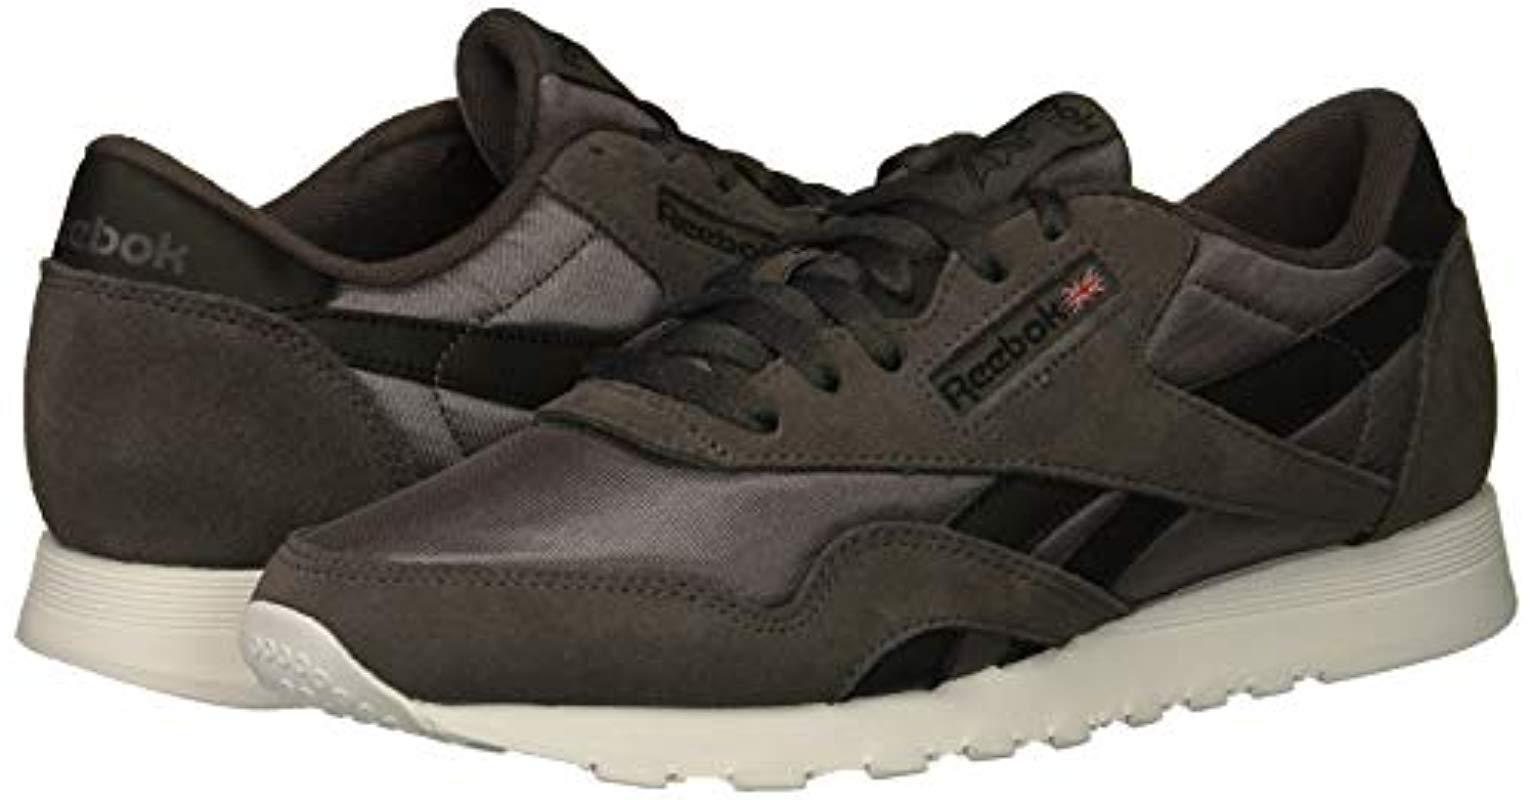 Men's Classic Nylon Sneaker, Ash Greyblackwhite, 6 M Us